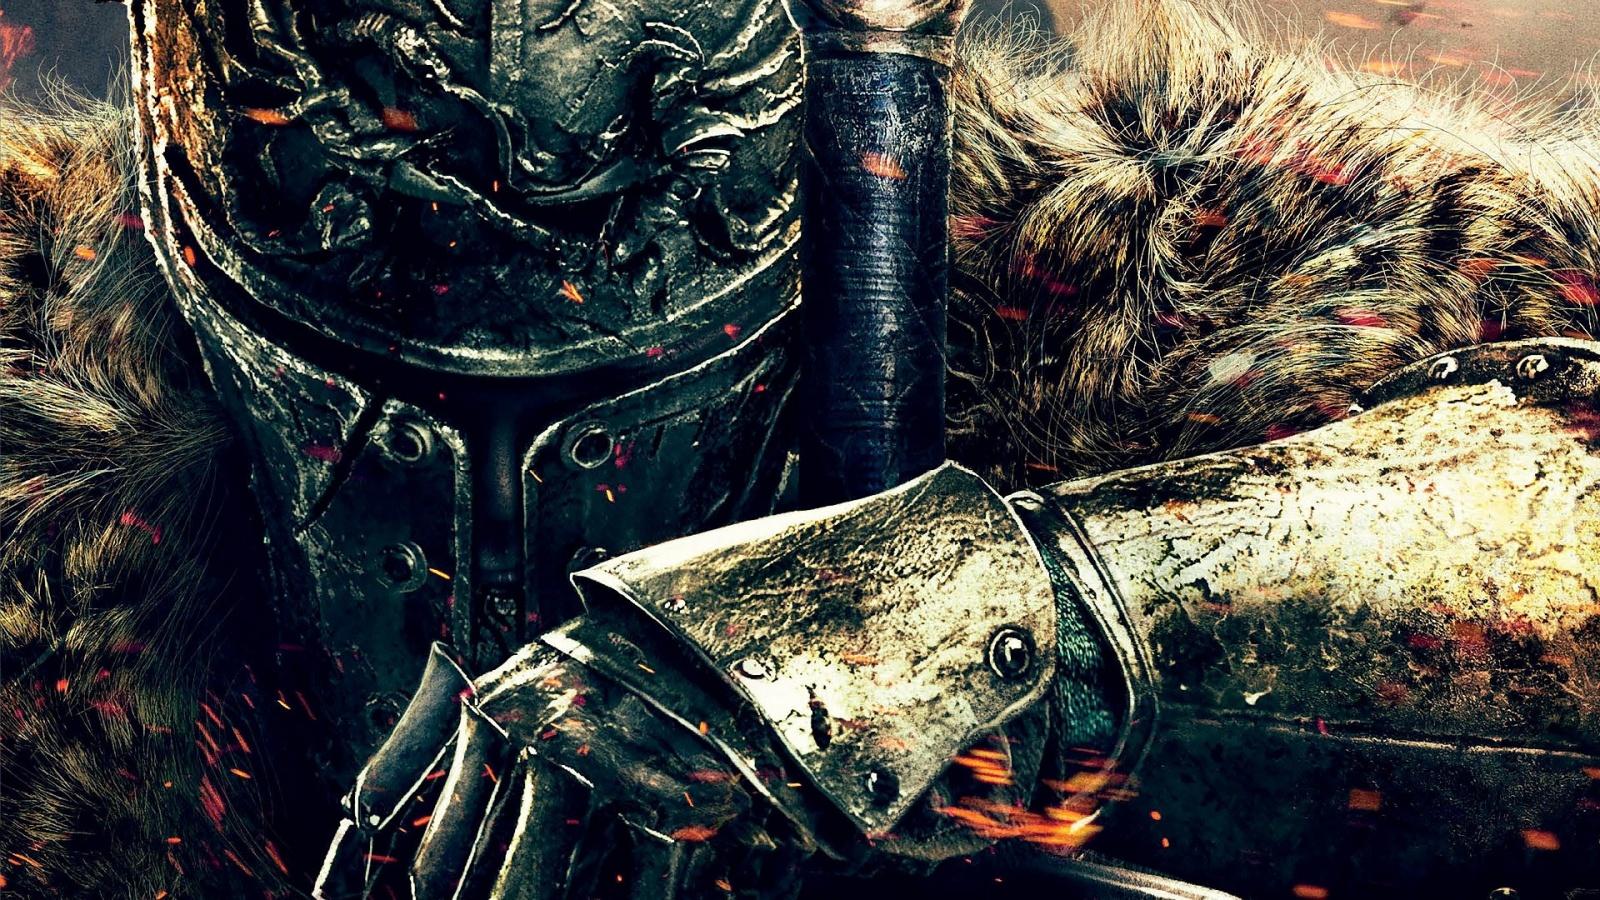 Dark Souls 2 Collectors Edition Wallpapers   1600x900   884234 1600x900